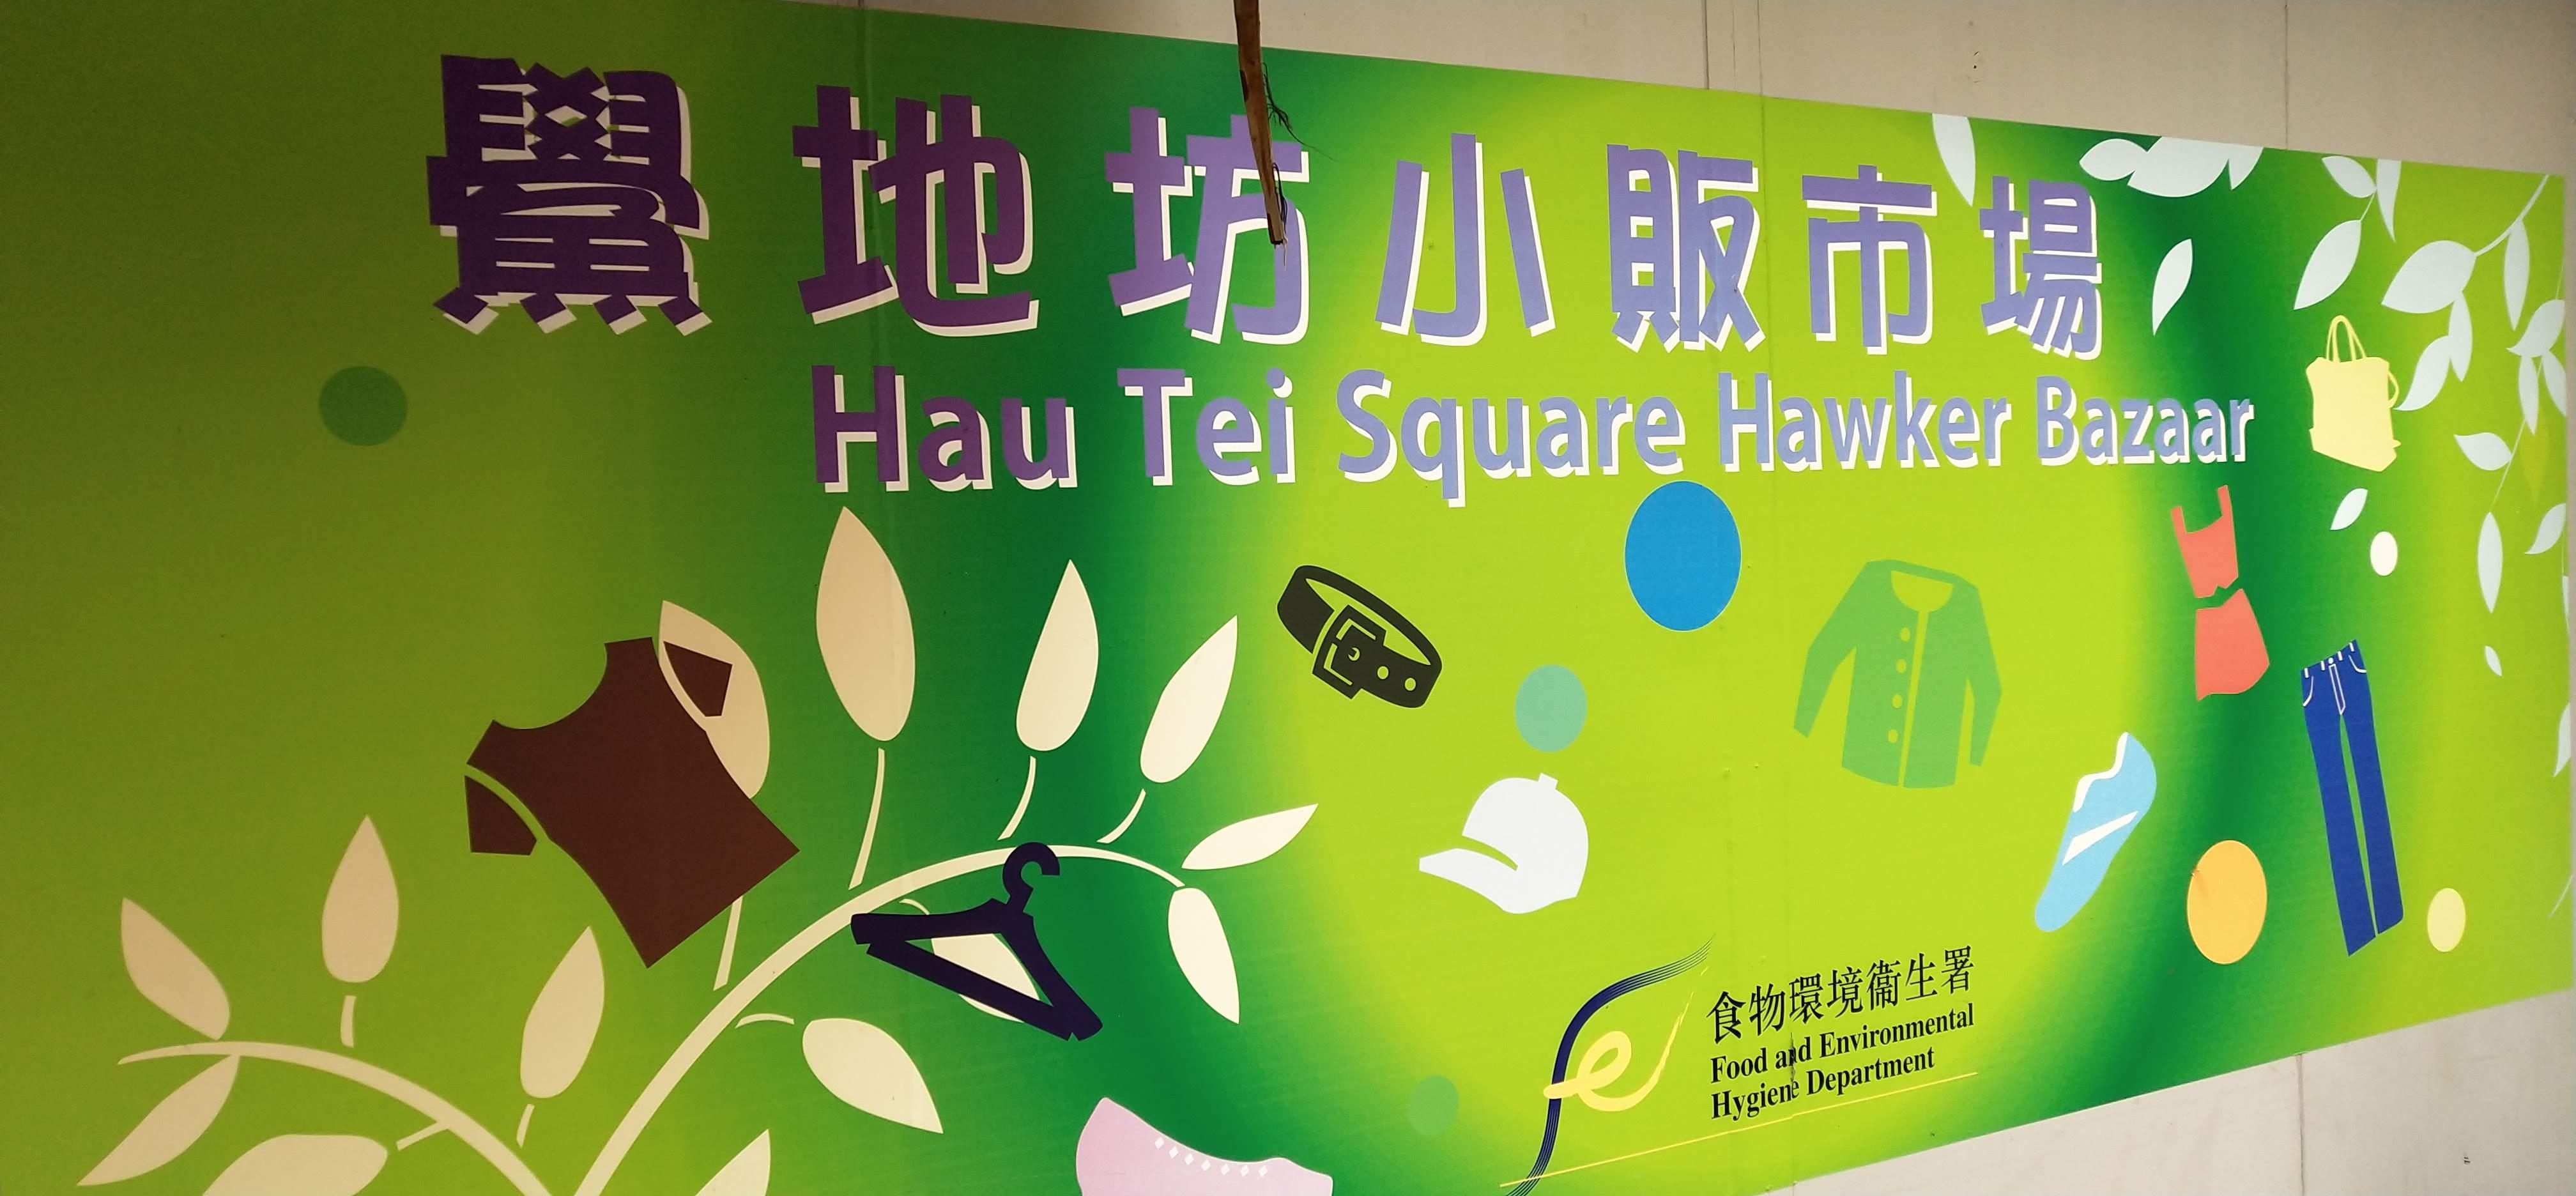 Hau Tei Square Hawker Bazaar